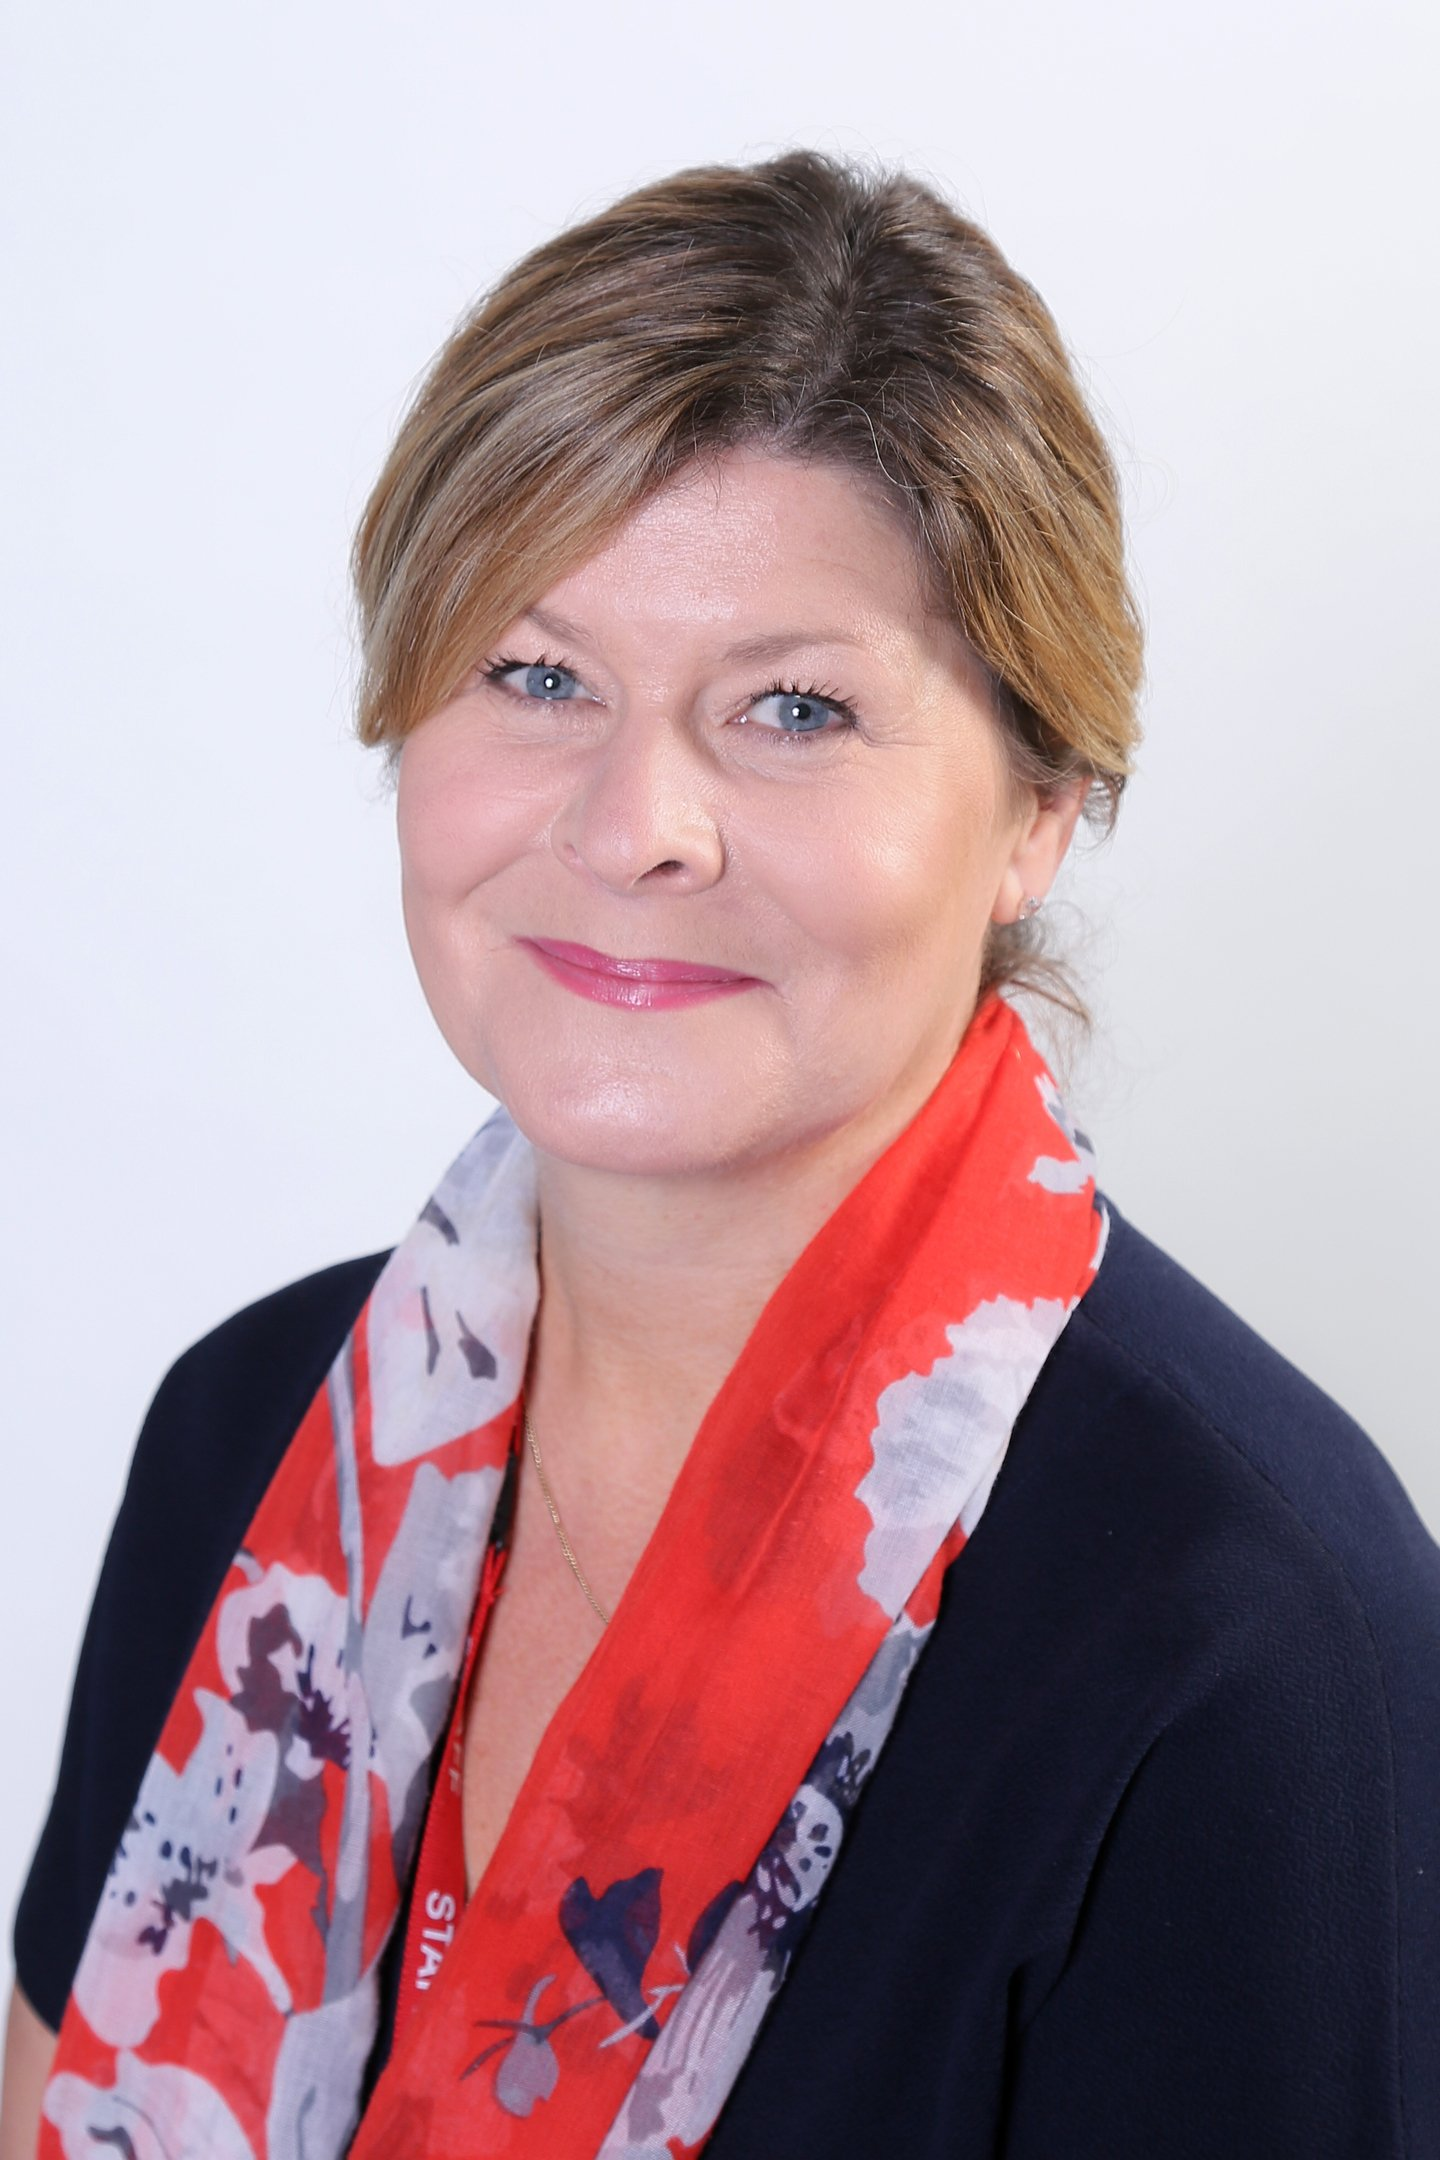 Anita Turley: School Administrator